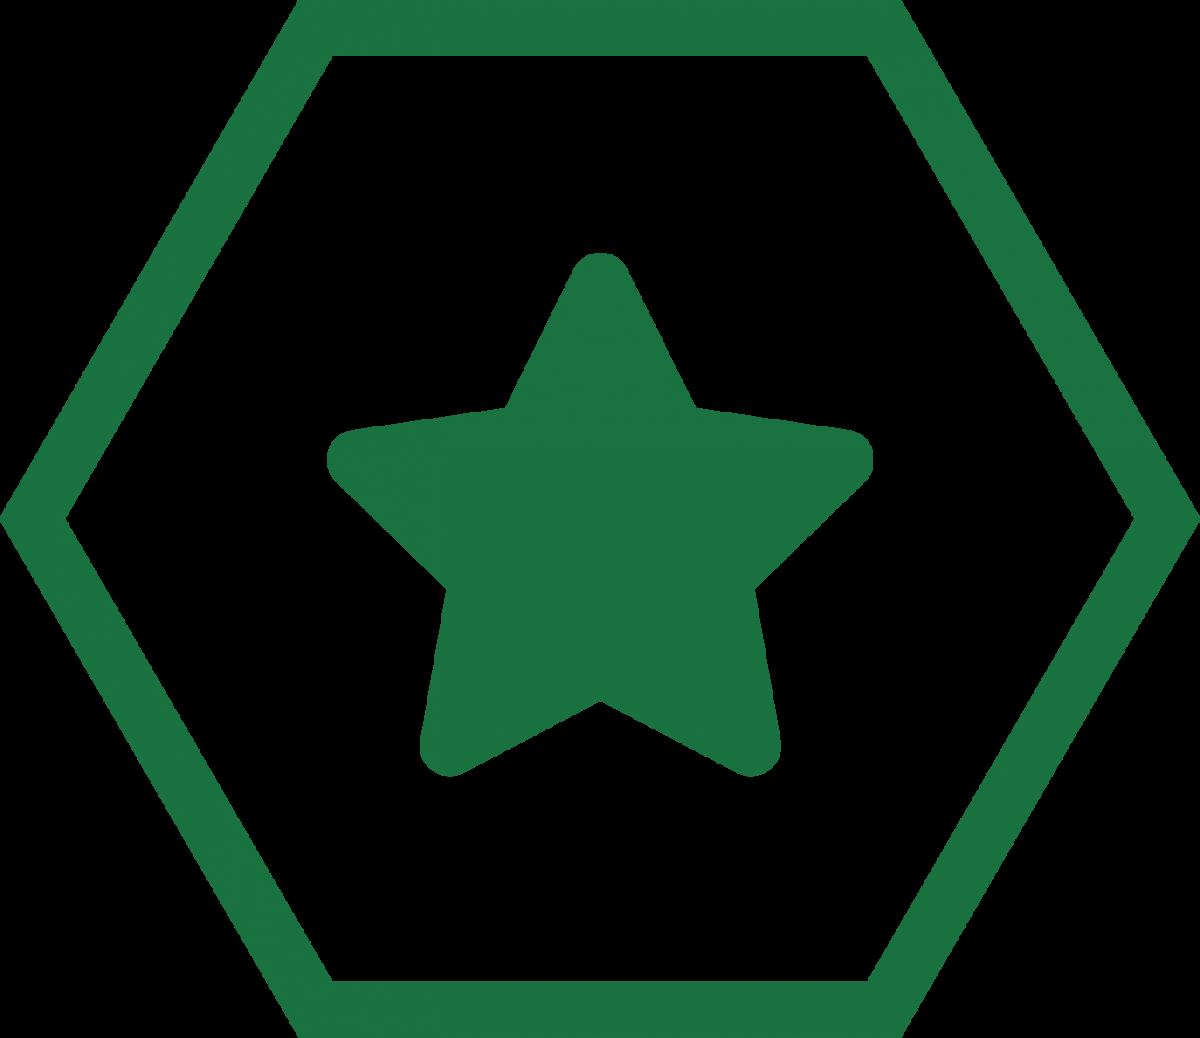 evergreenadditionaliconstar raleigh charlotte